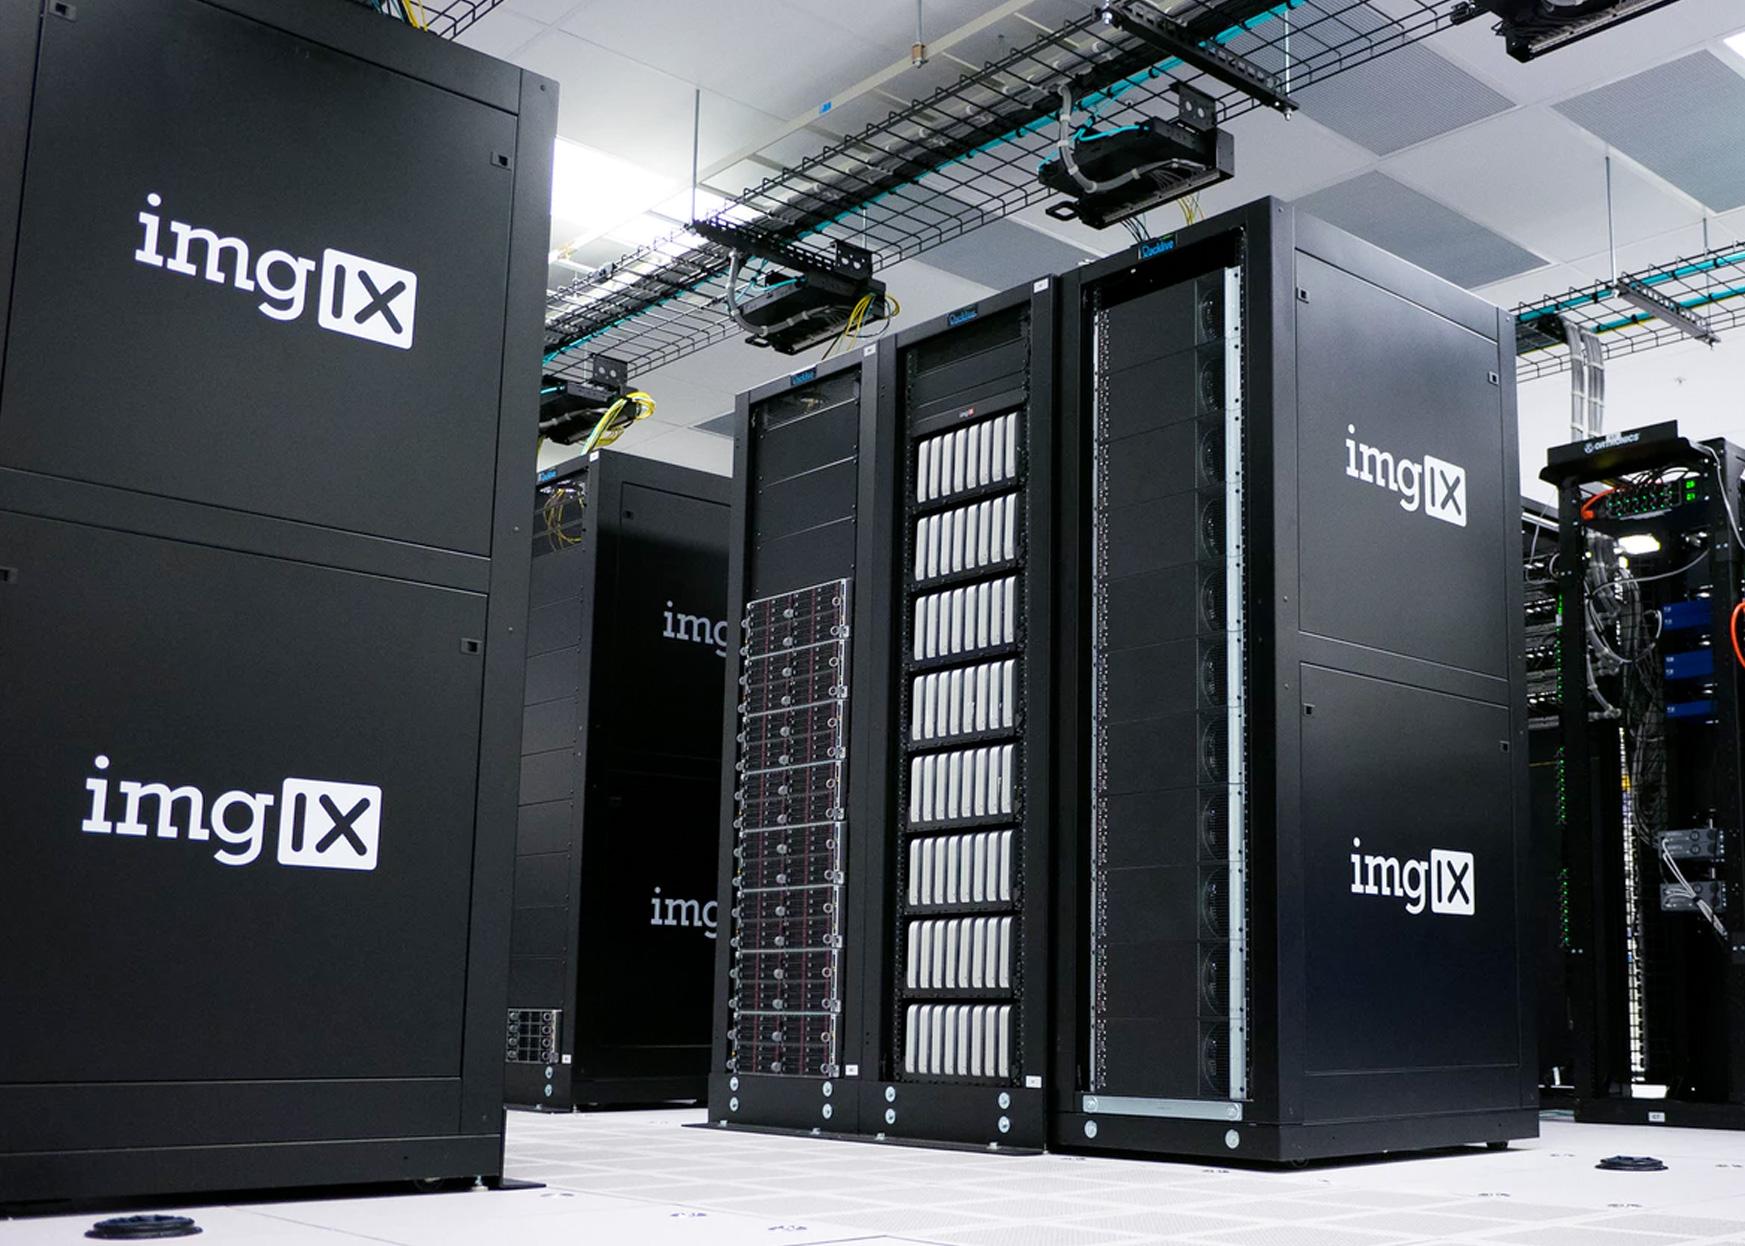 IMG IX Servers